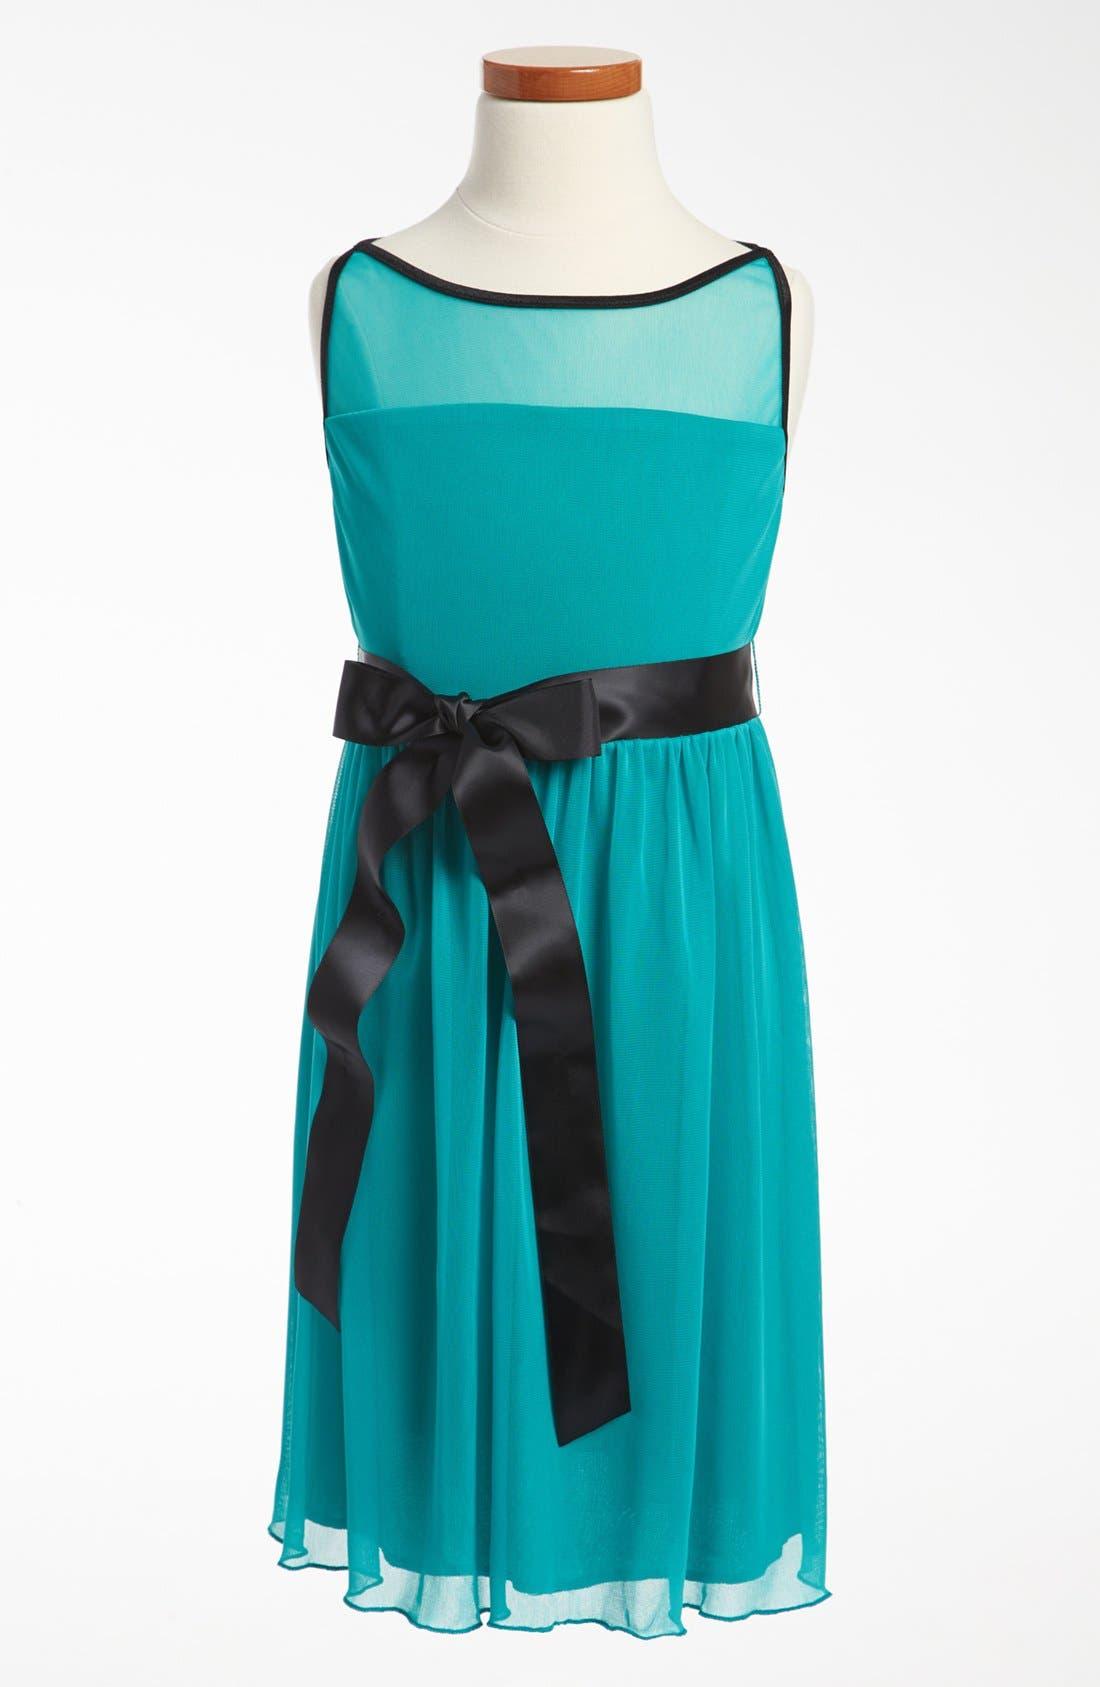 Alternate Image 1 Selected - Roxette Illusion Yoke Dress (Big Girls)